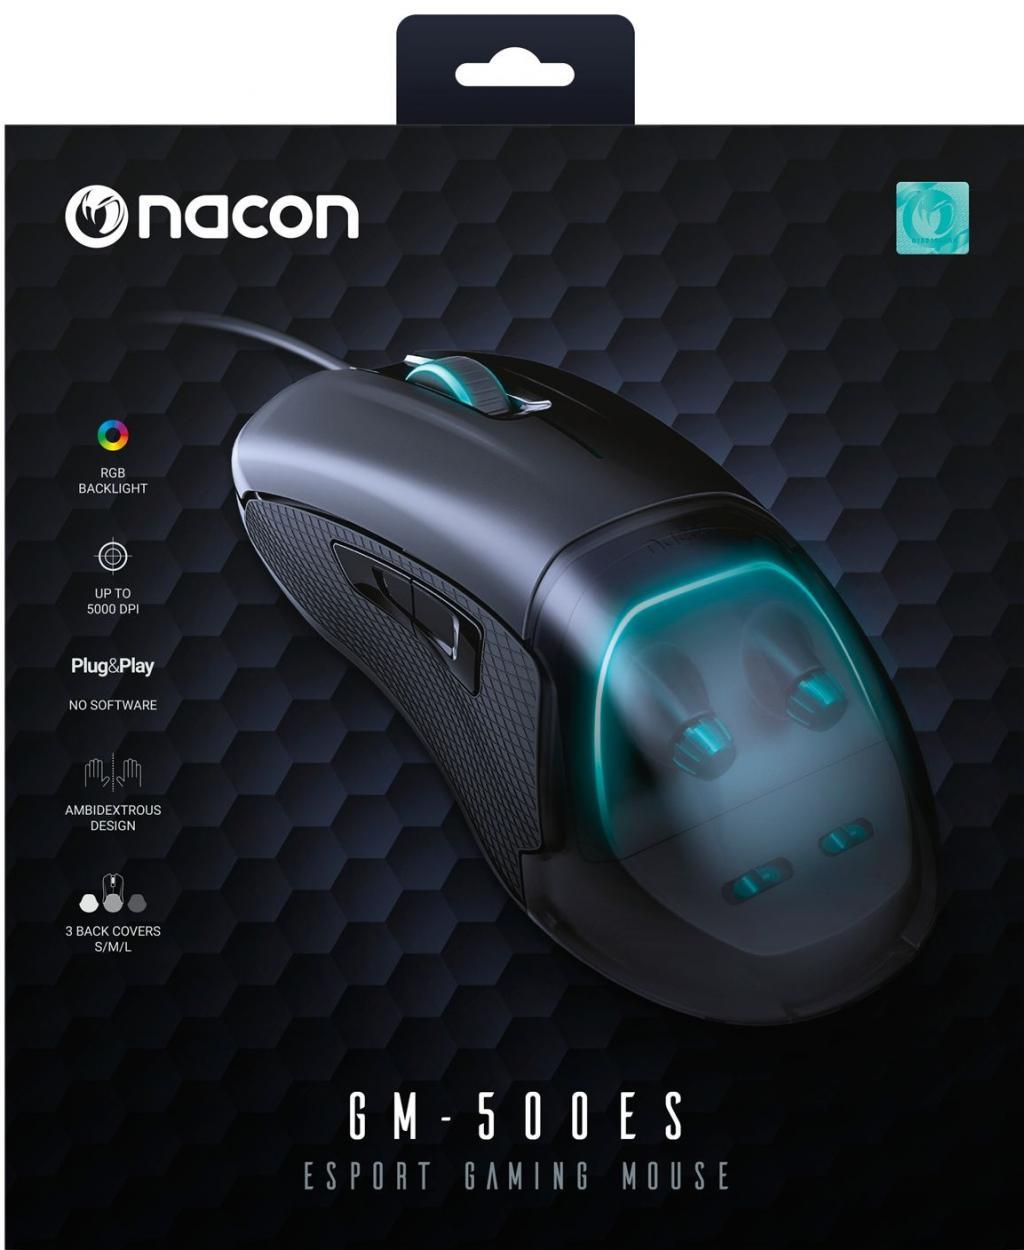 NACON E-SPORTS GAMING MOUSE GM-500ES - PROMO_2